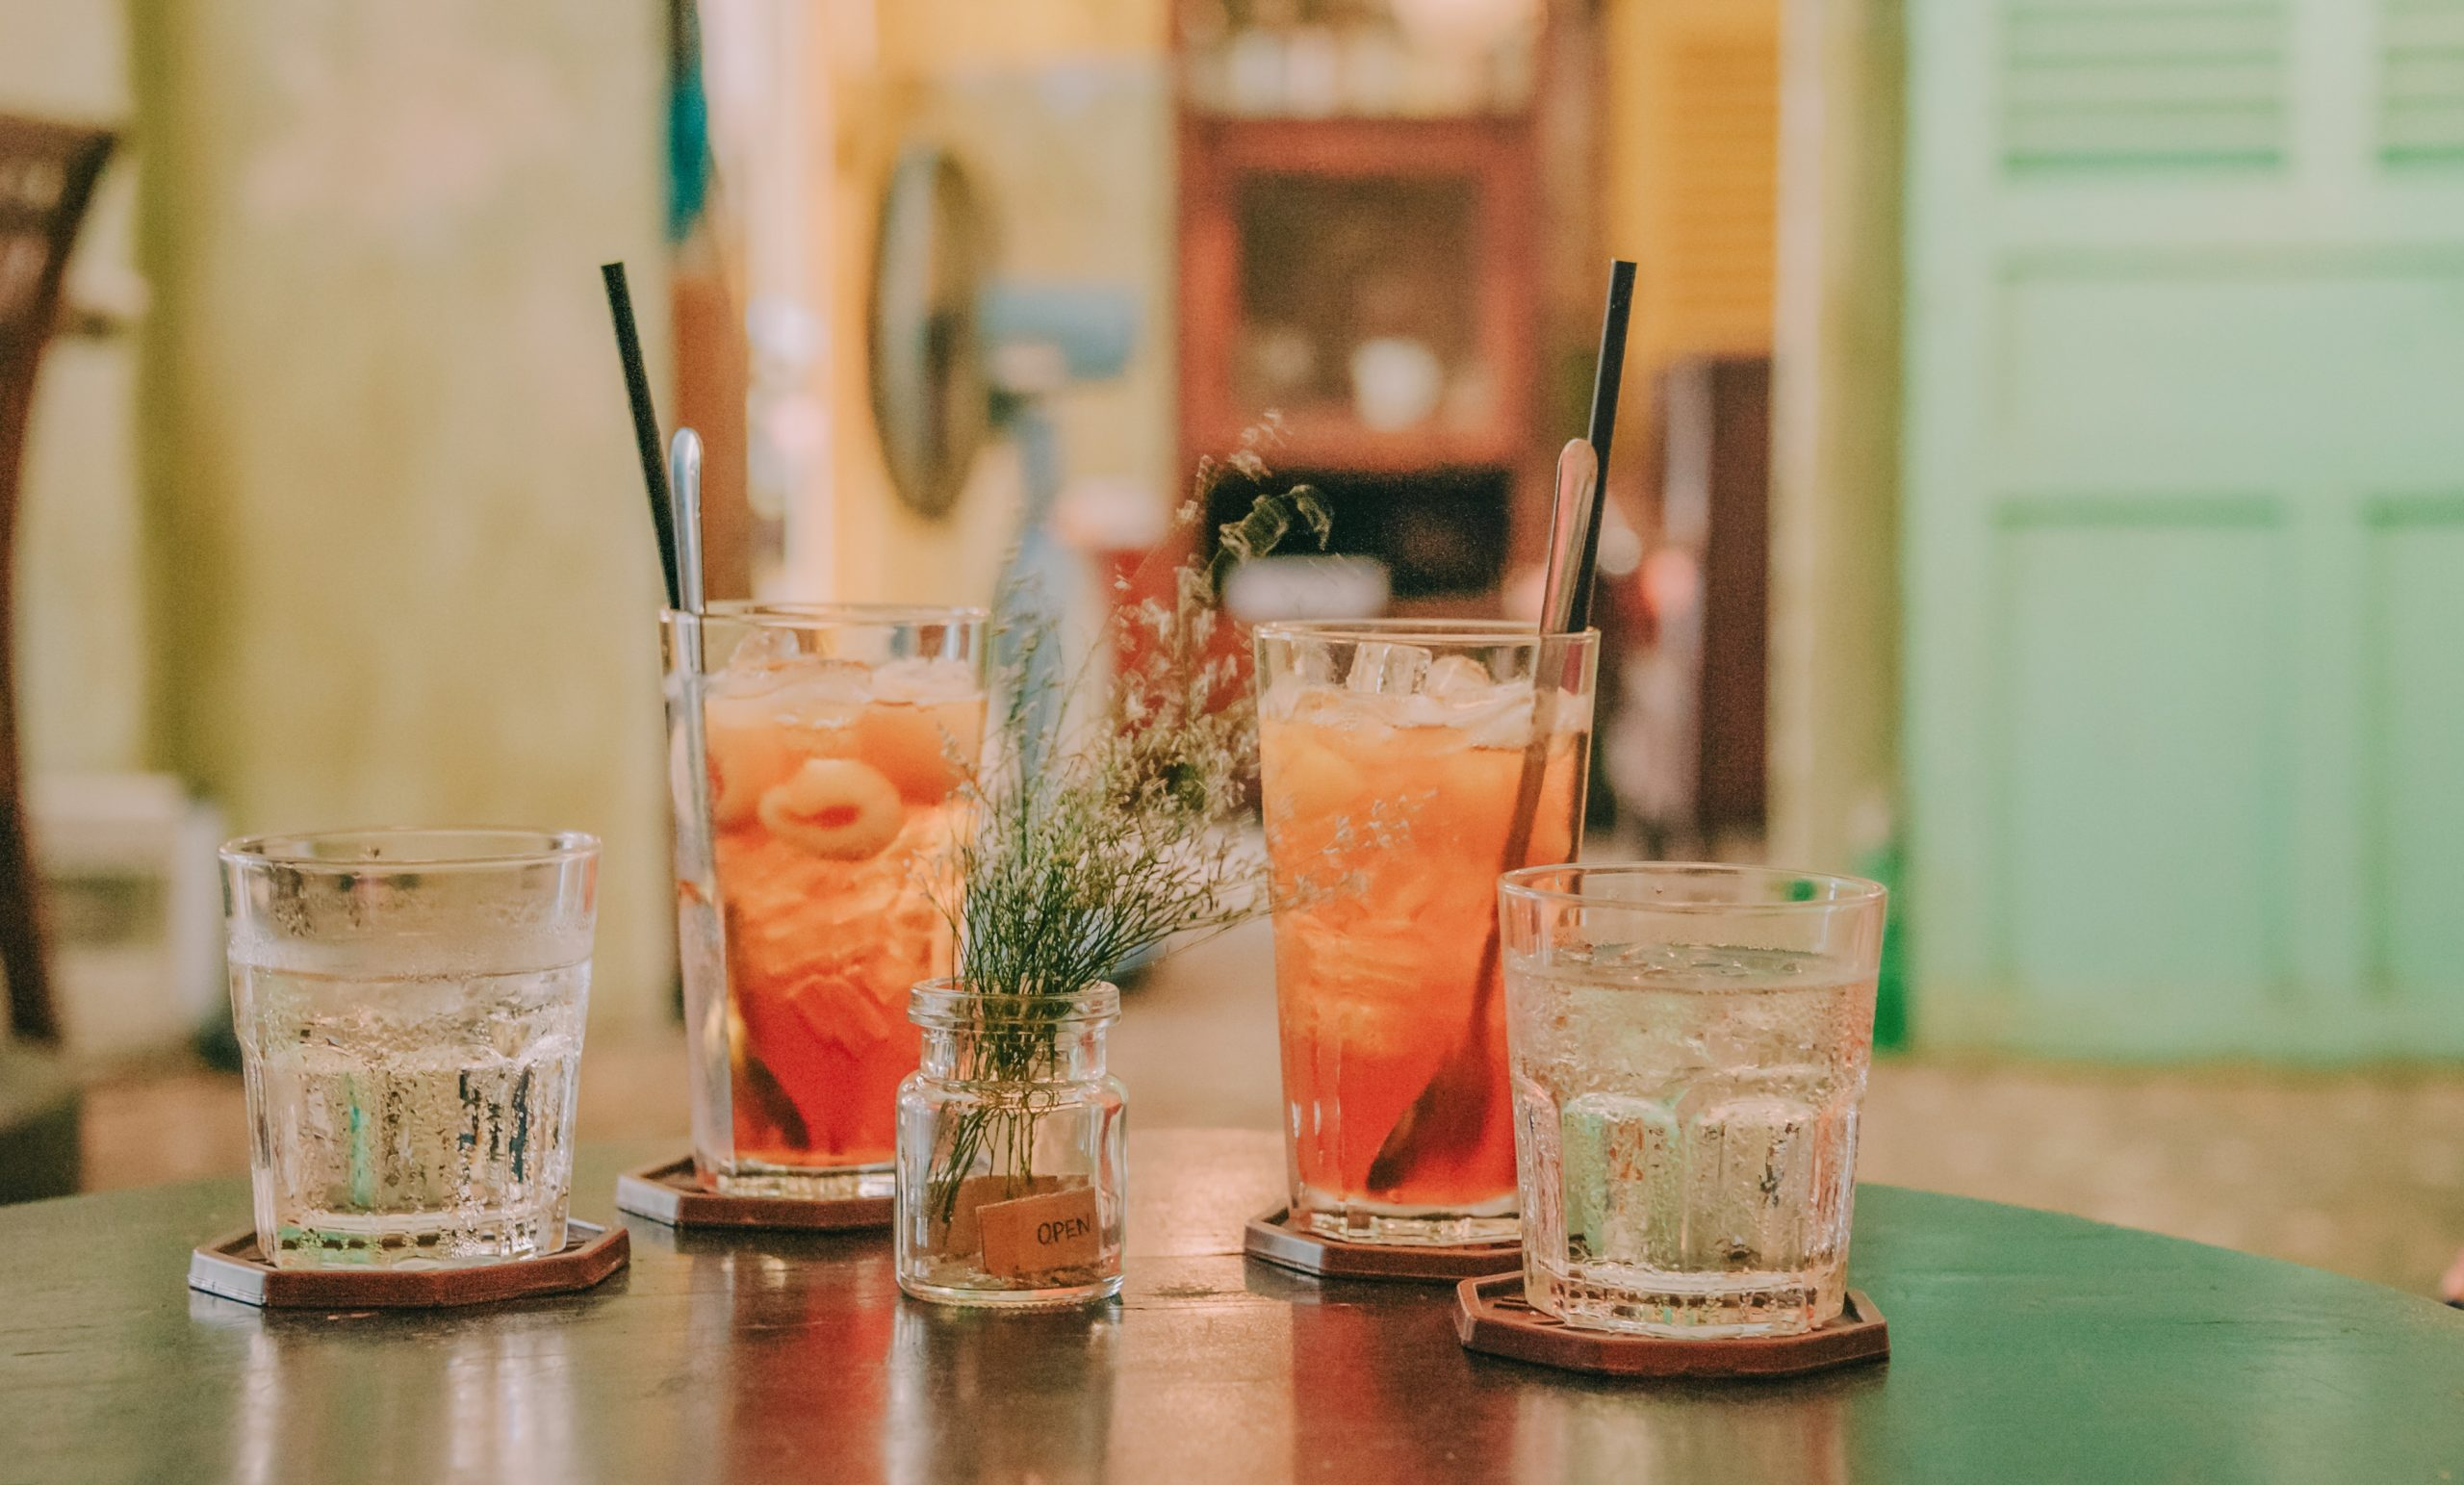 Amvyx #menoumespiti και απολαμβάνουμε τα αγαπημένα μας ποτά